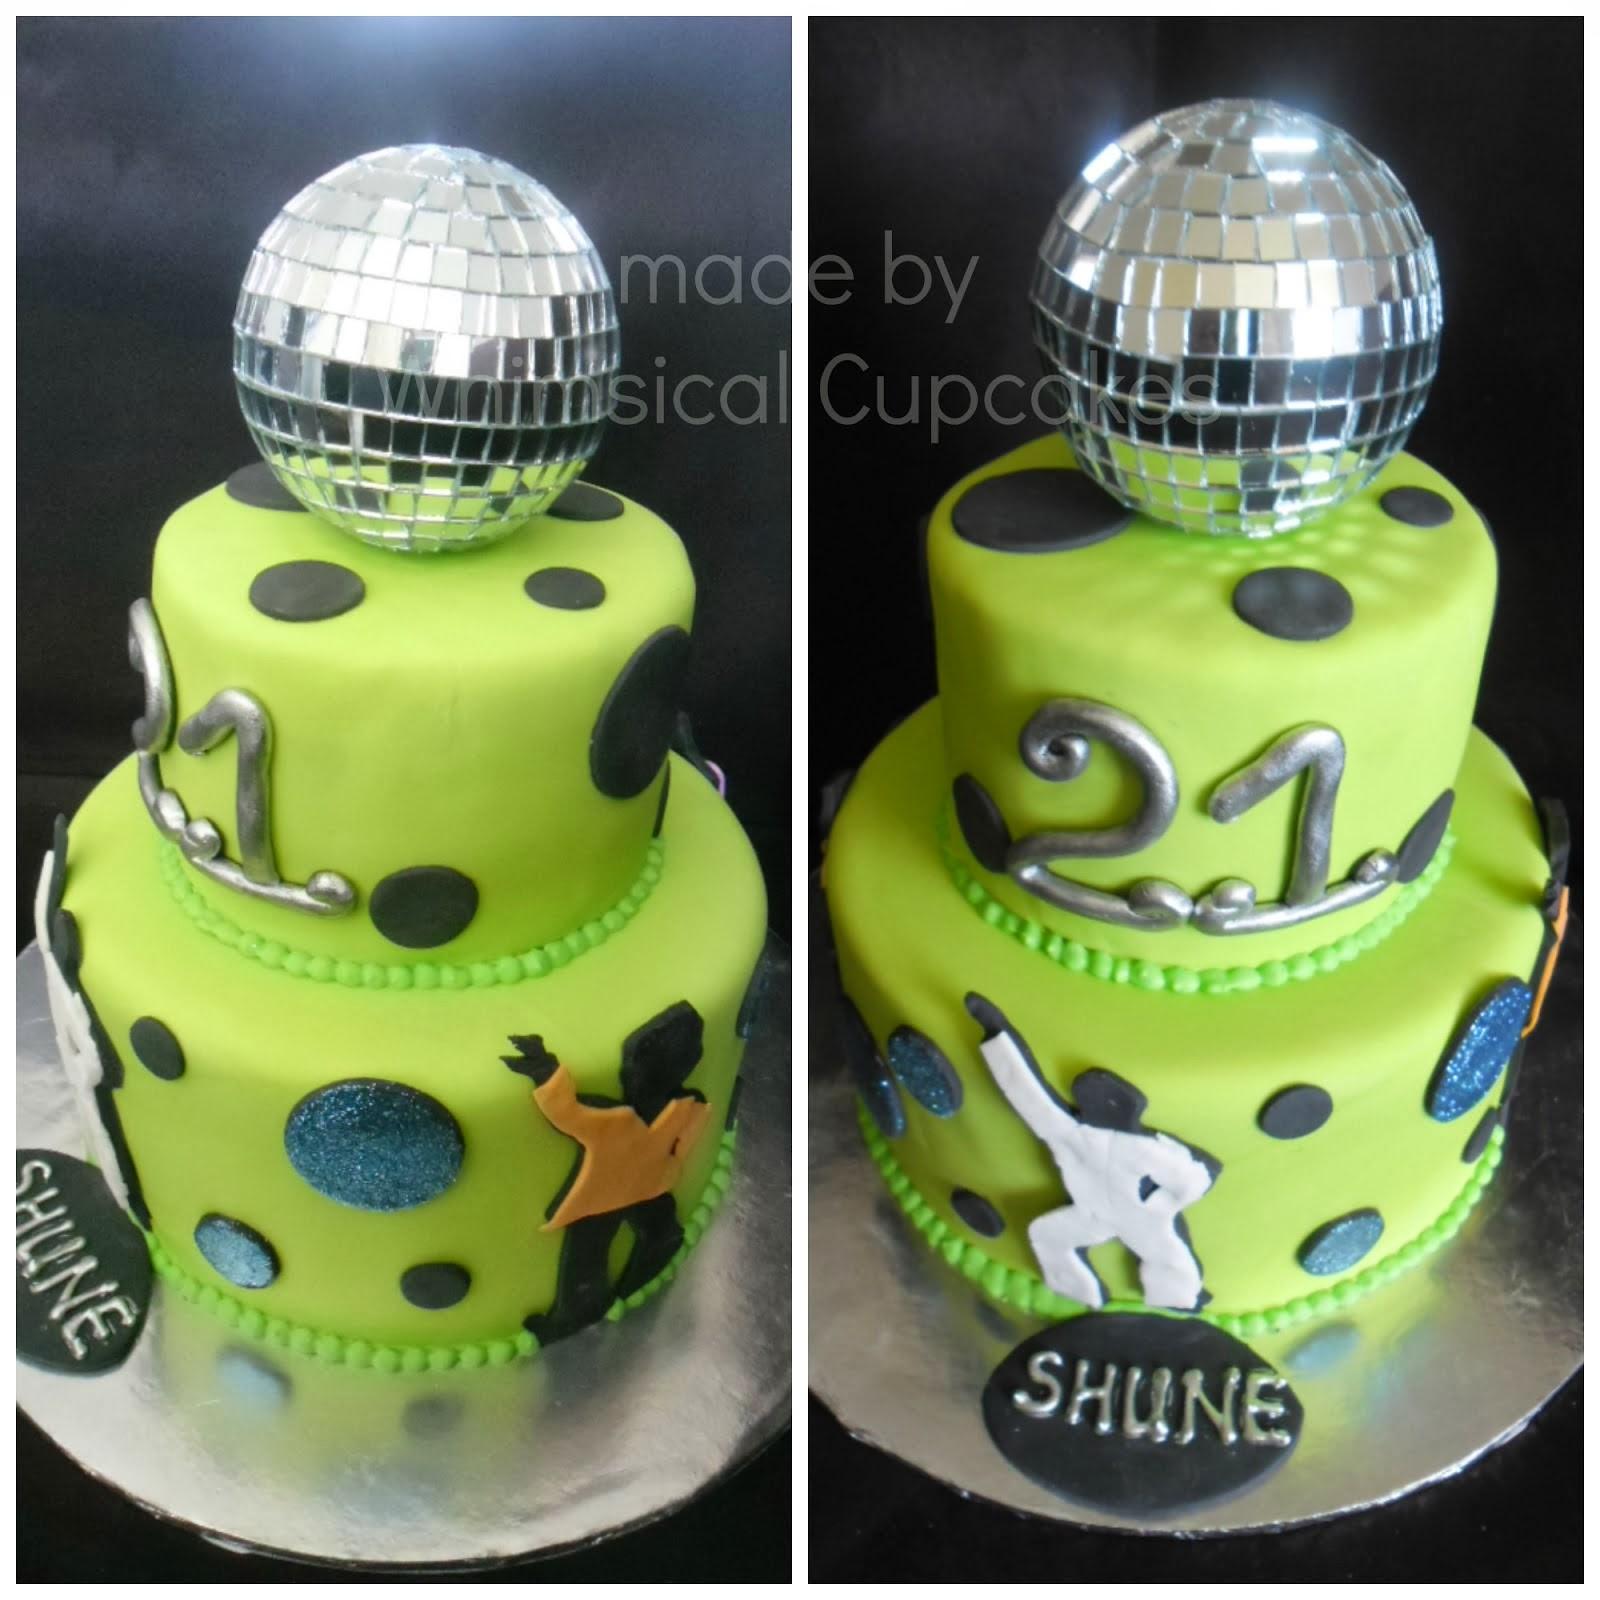 Whimsical Disco Themed Cake